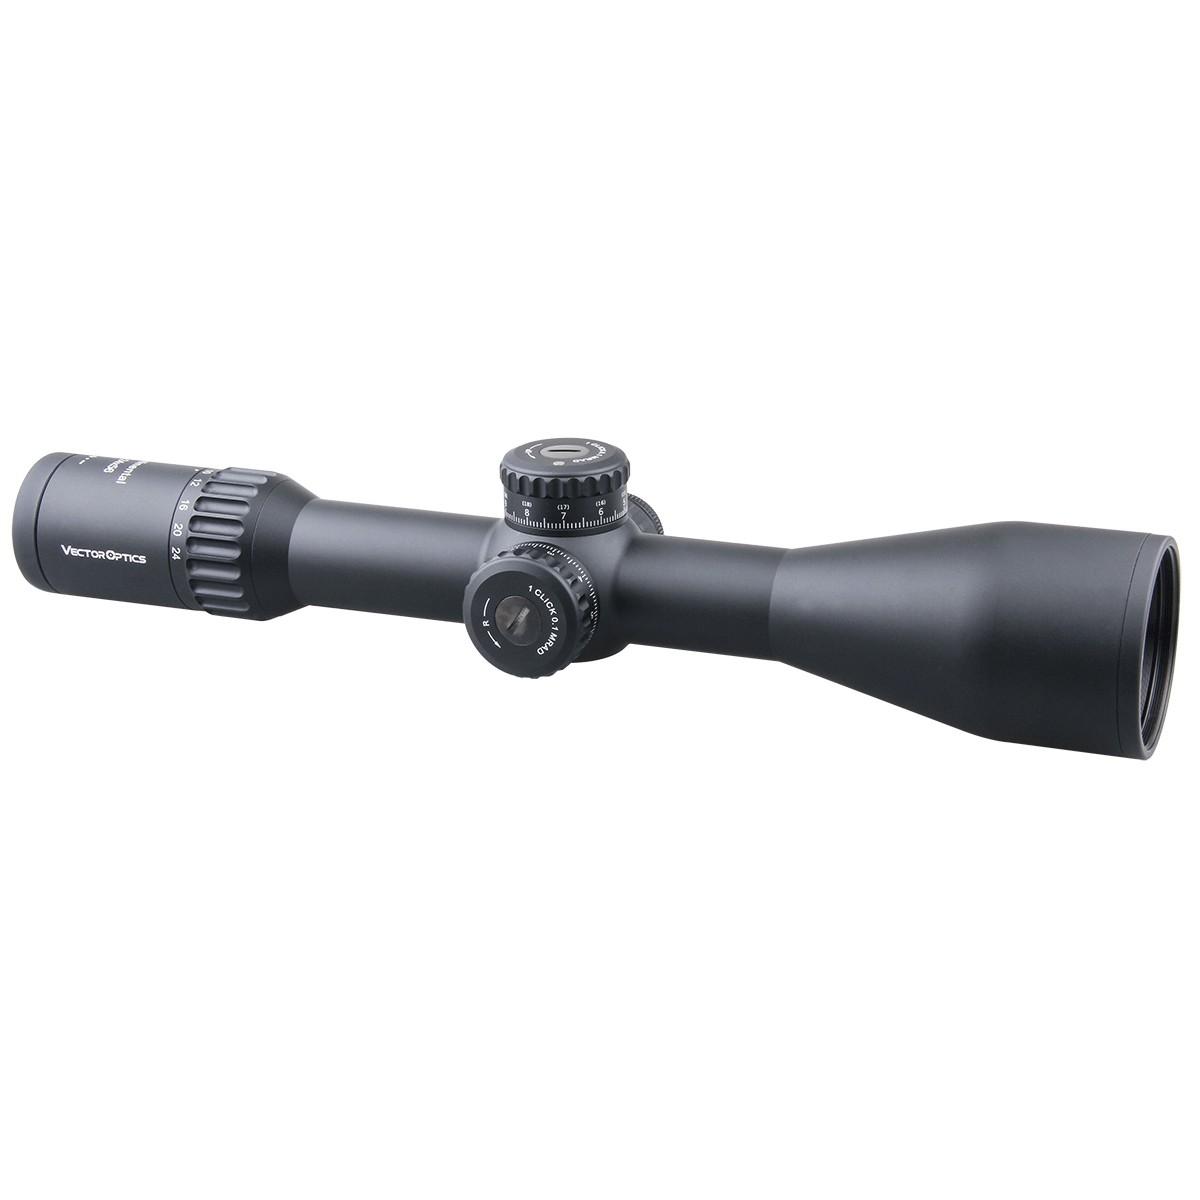 34mm Continental 4-24x56FFP Riflescope